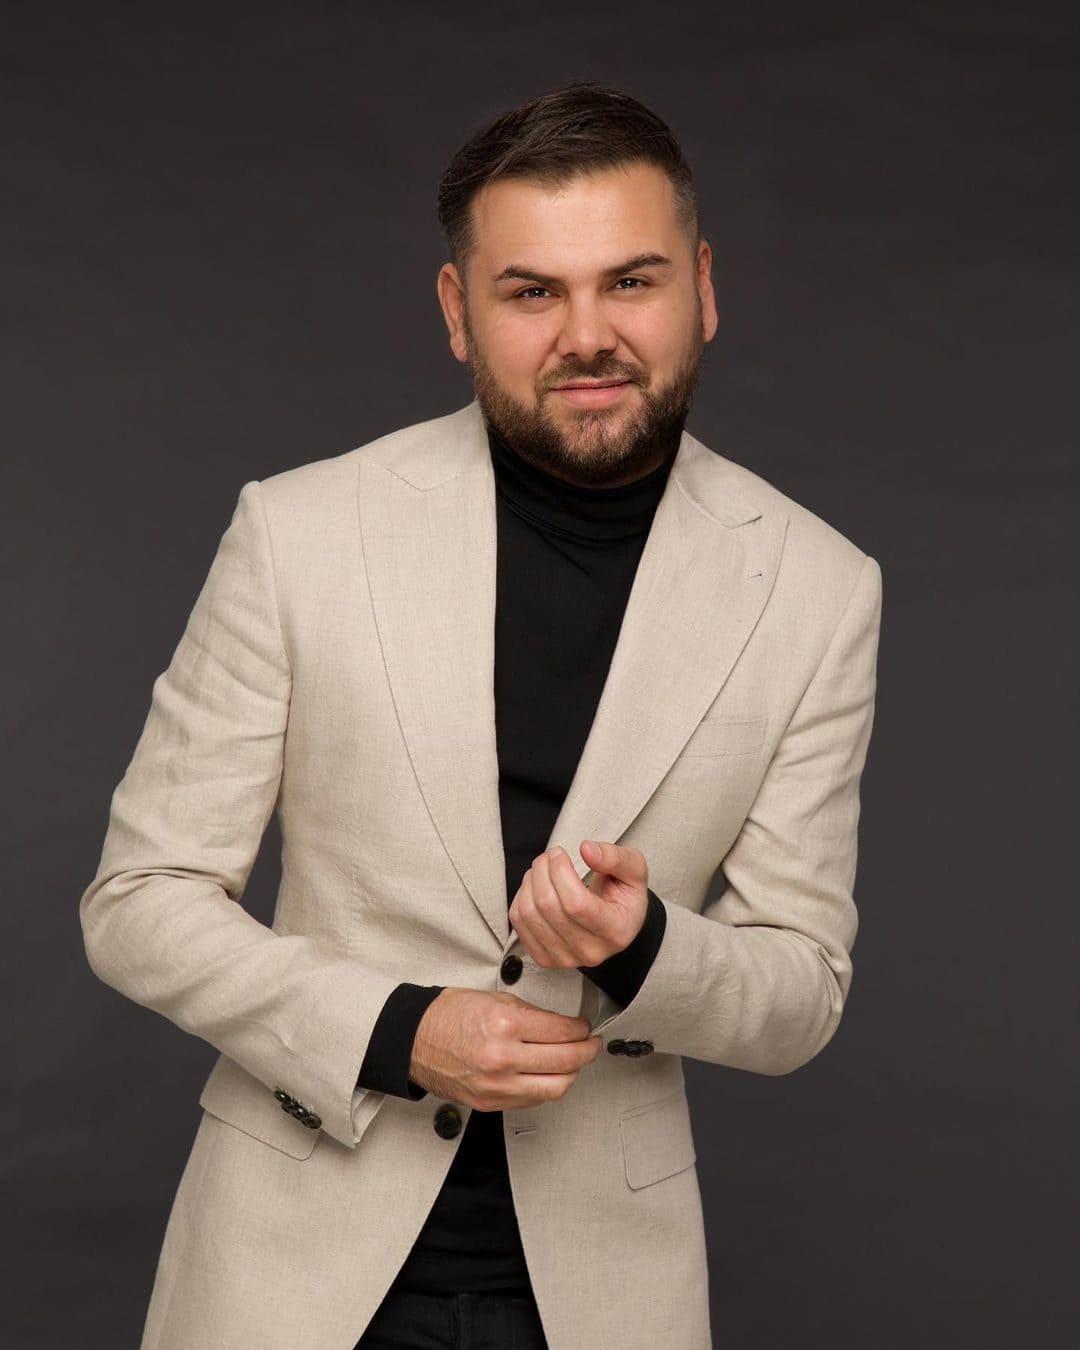 Saygin Yalcin (Entrepreneur) Wiki, Age, Wife, Net Worth & More 5